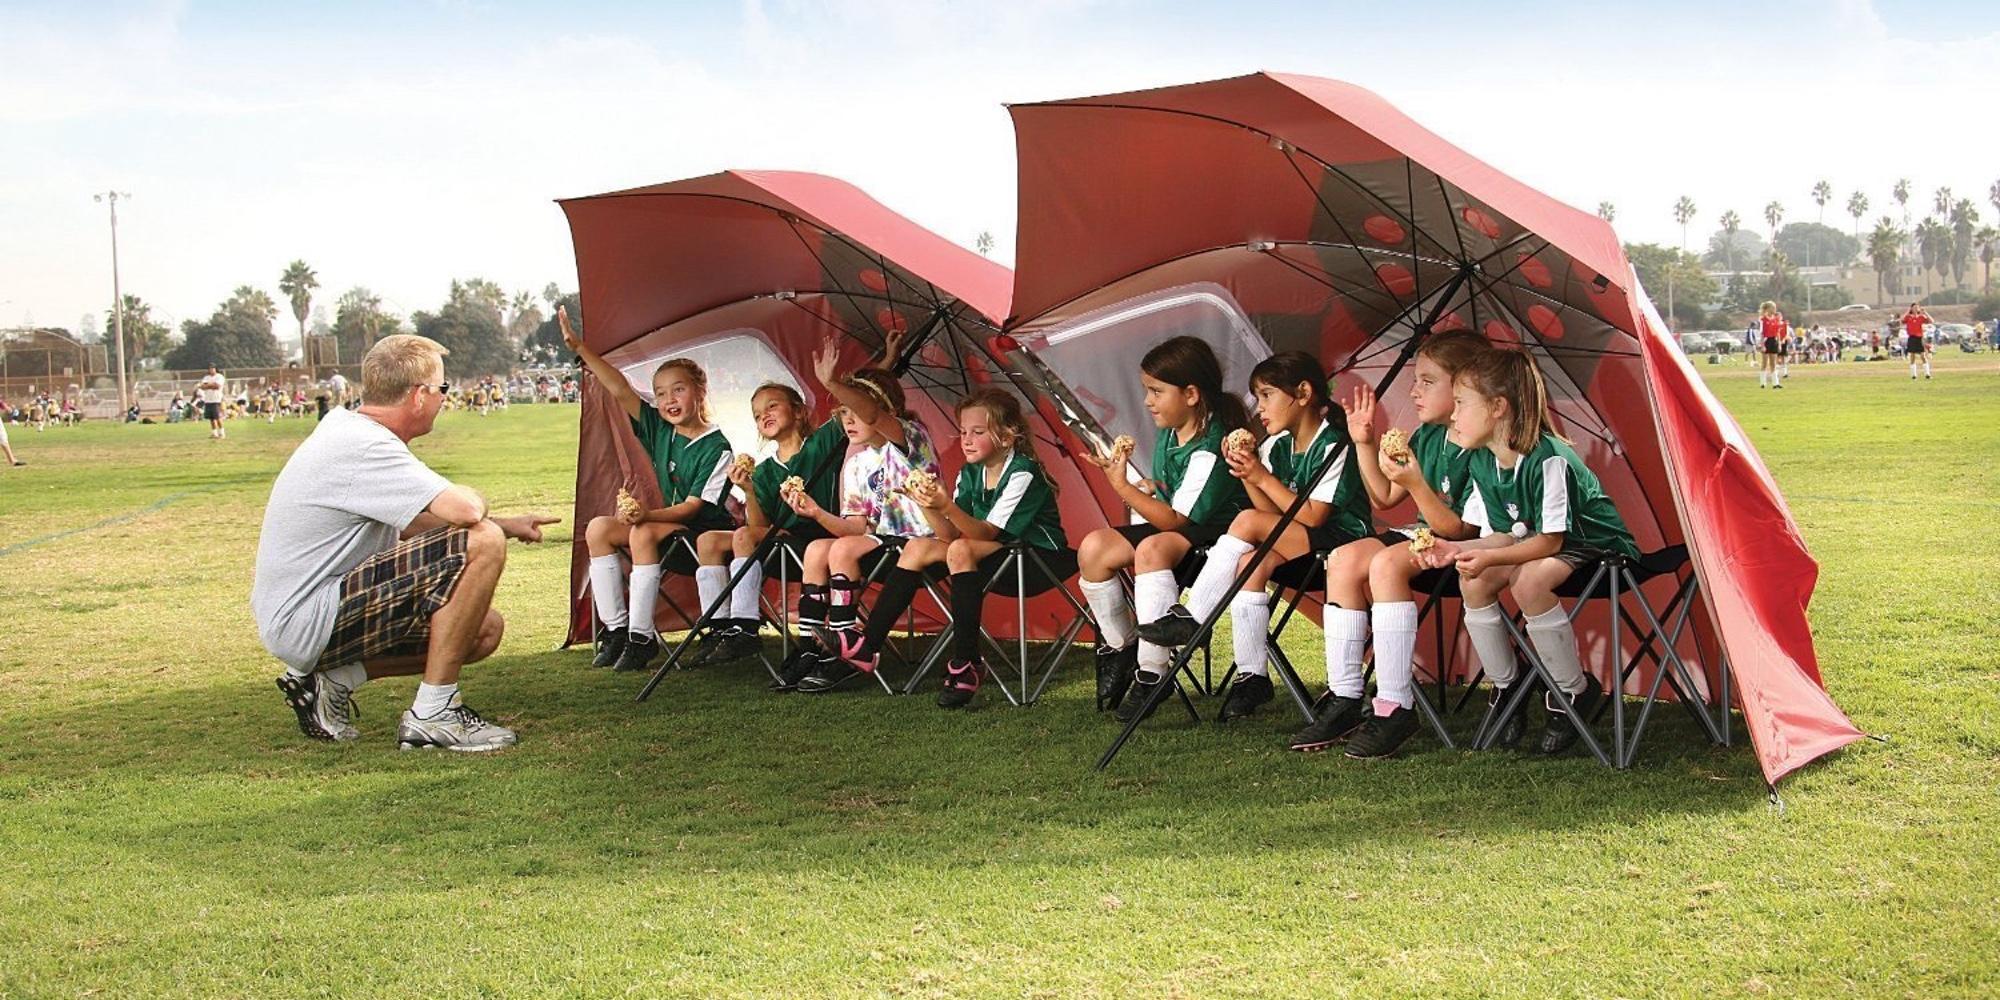 6c5fc3780662 Save 40% off the Sport-Brella All-Weather and Sun Umbrella for $36 shipped